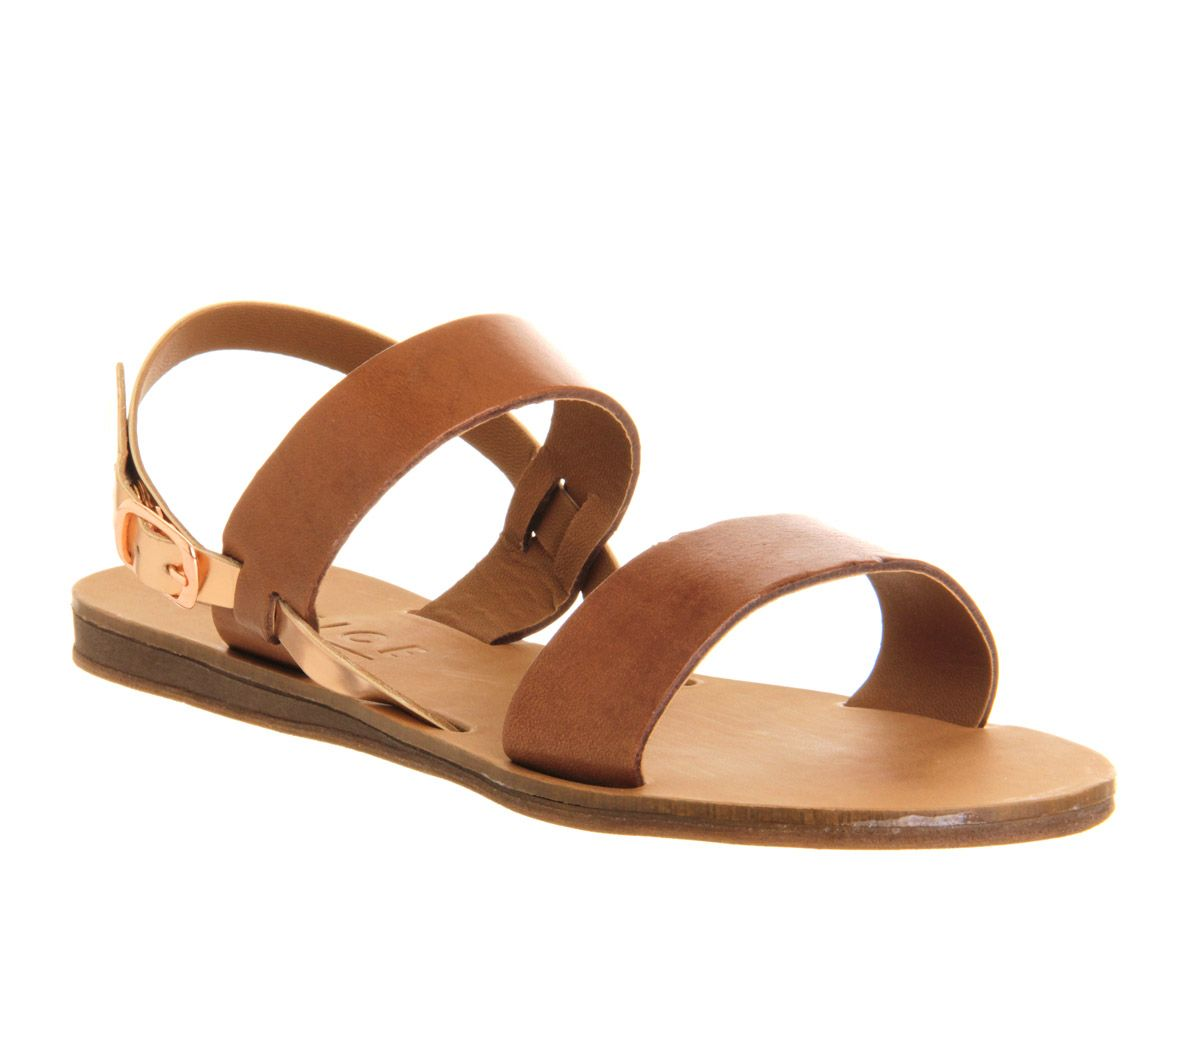 Office Honey Sling Back Sandal Tan Leather - Sandals